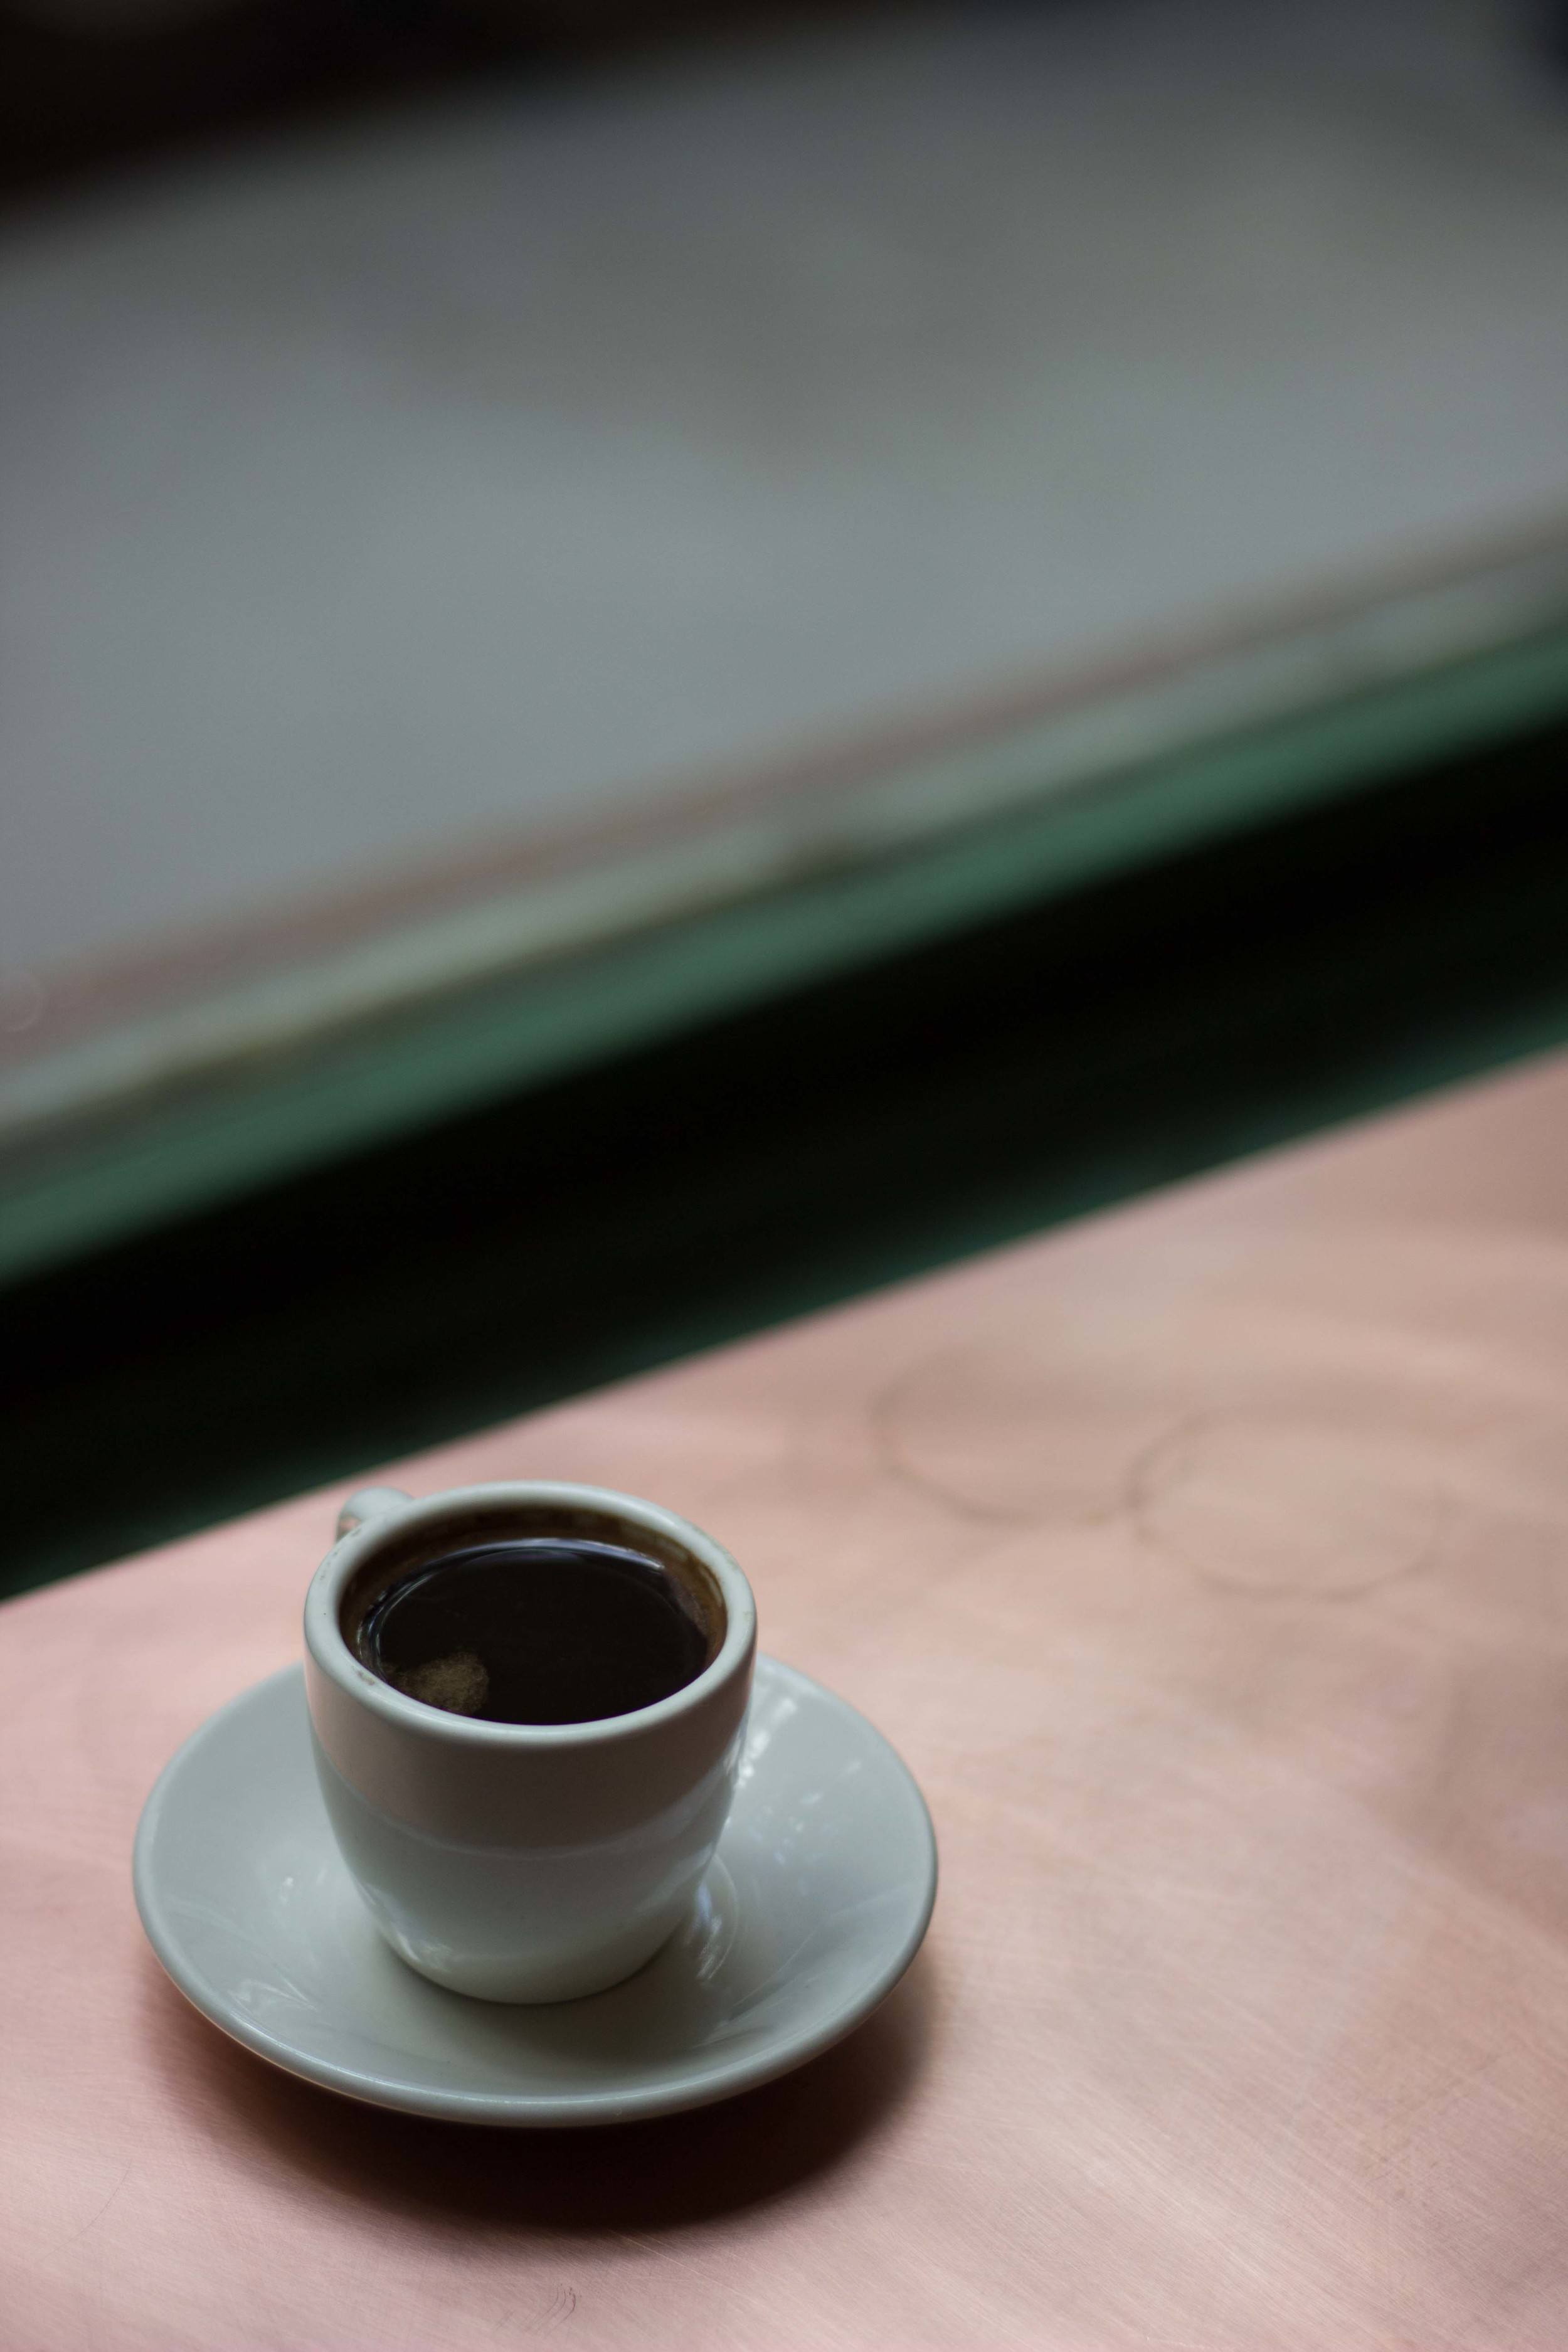 cafe moustache pitza turkish coffee new york west village walksmilesnap irra korrelat.jpg